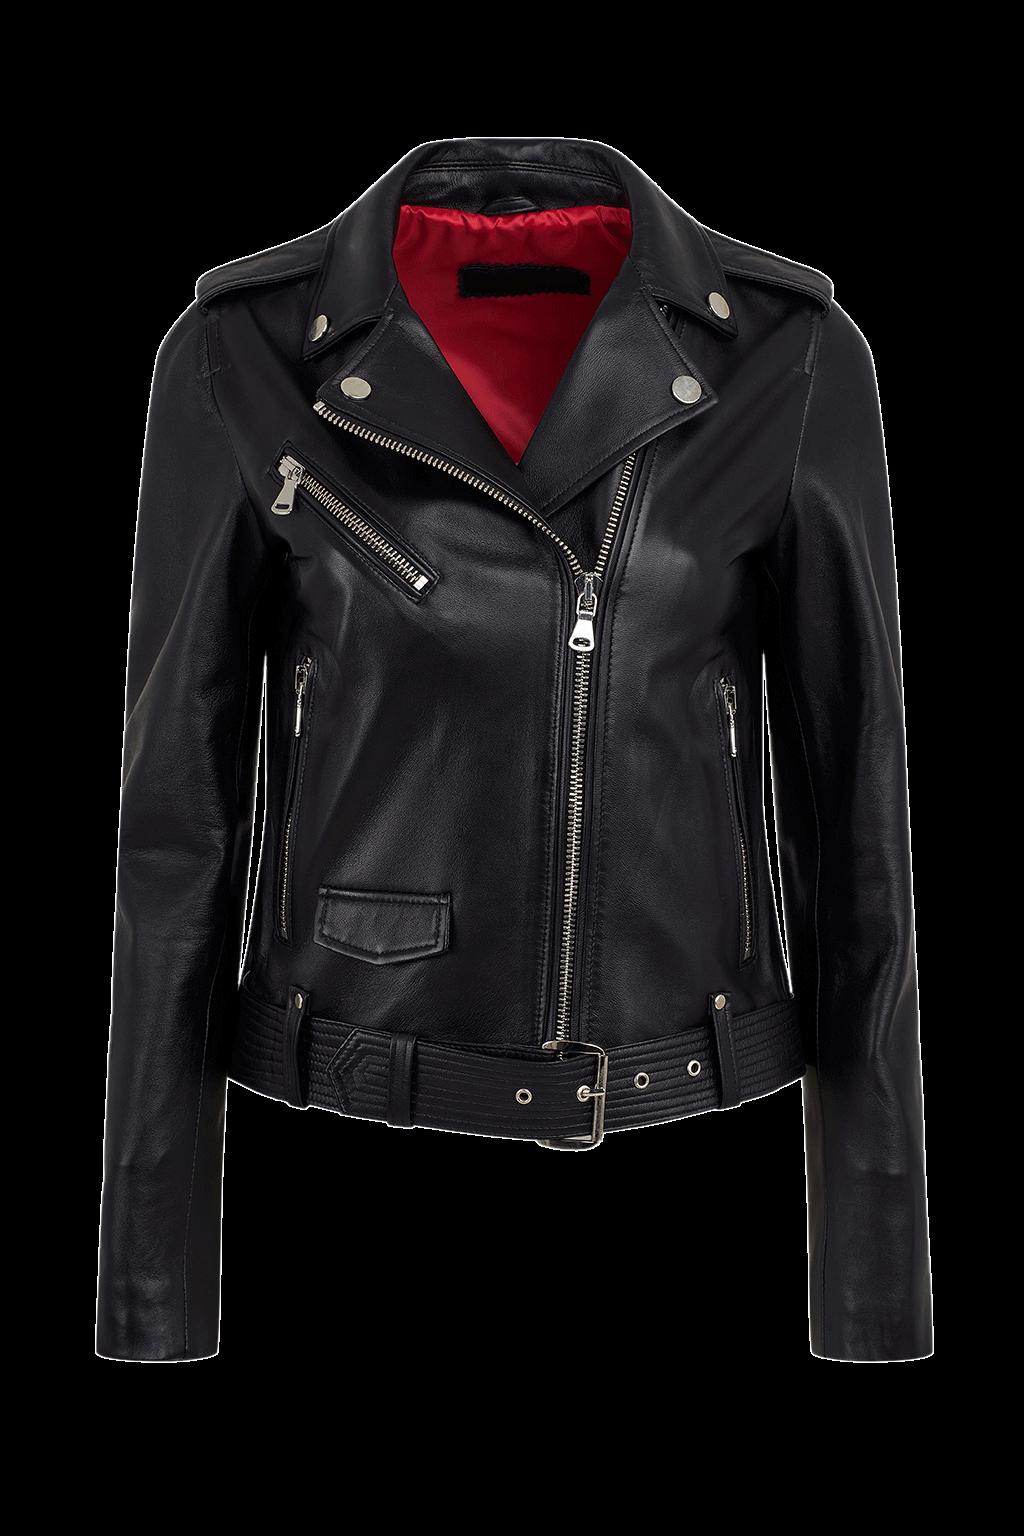 Women's Double Rider Leather Jacket - Jet Black